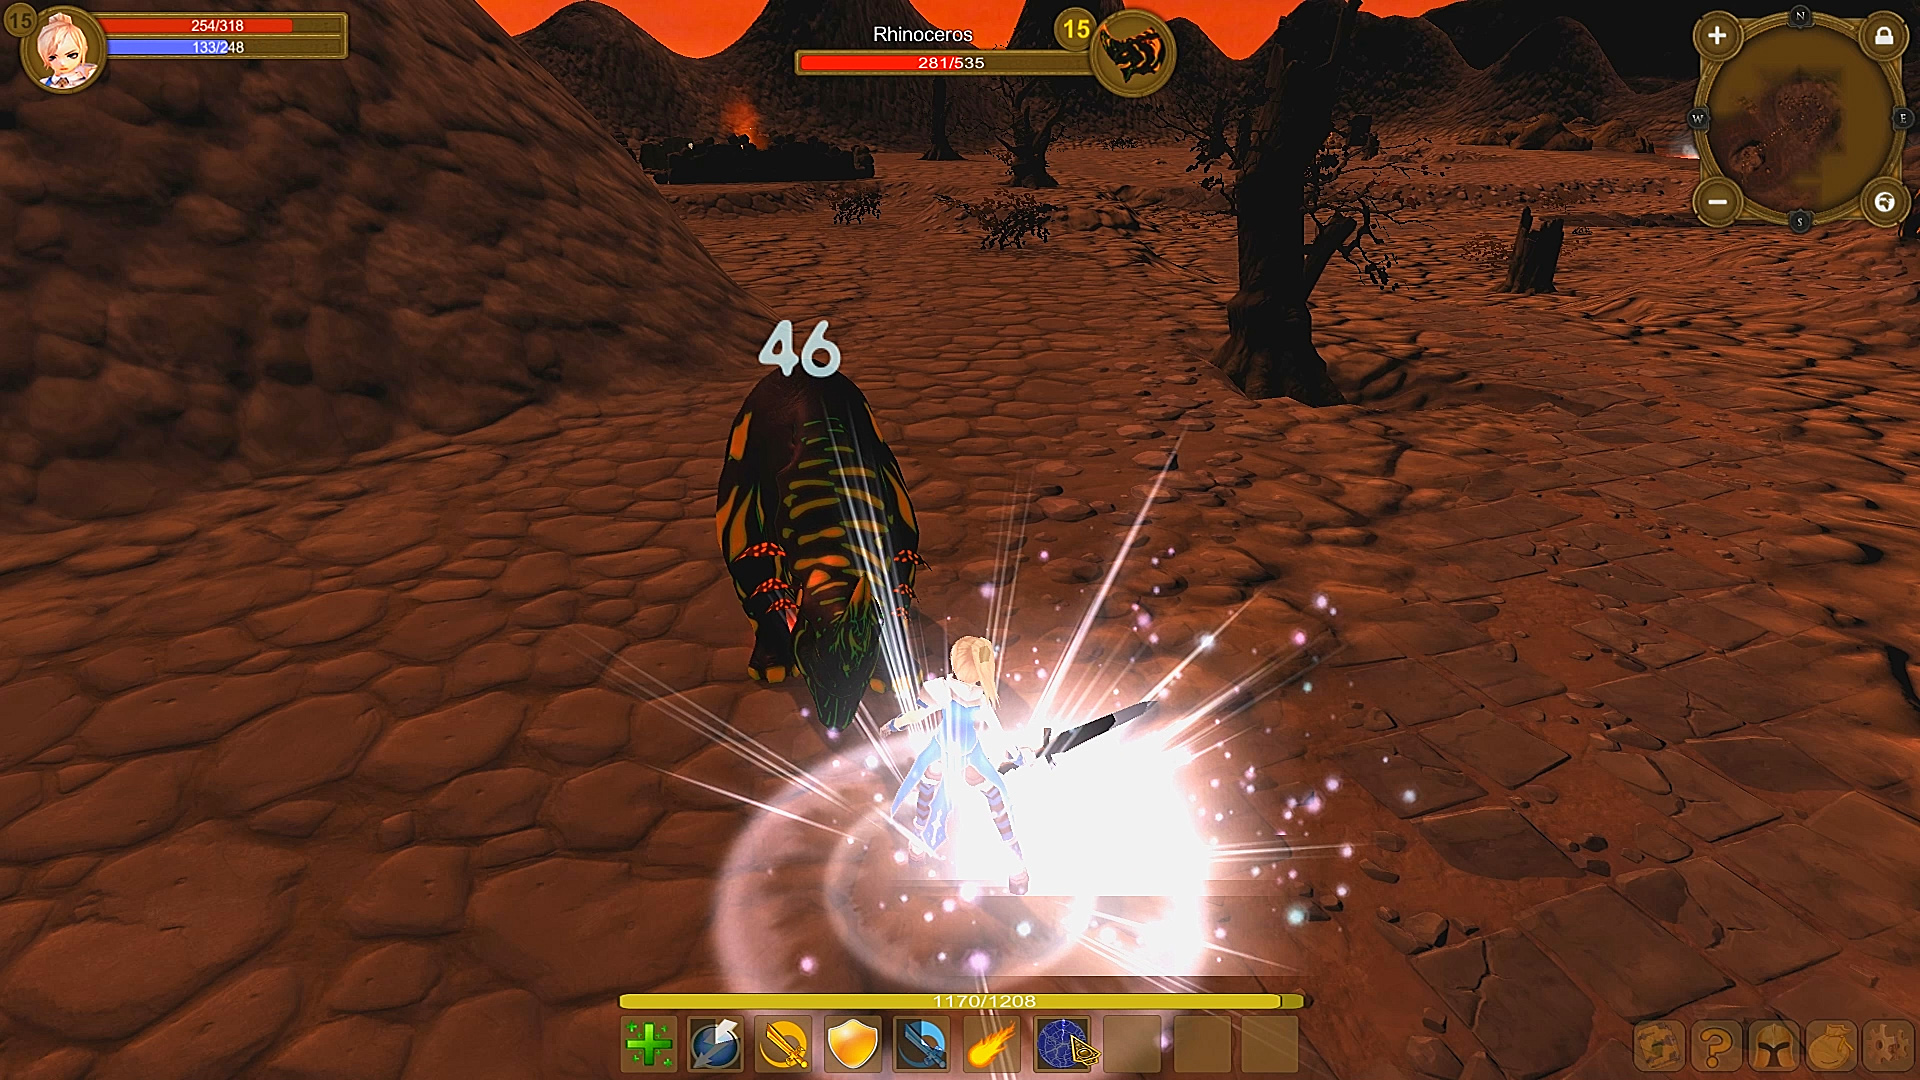 The Sorceress Screenshot 1